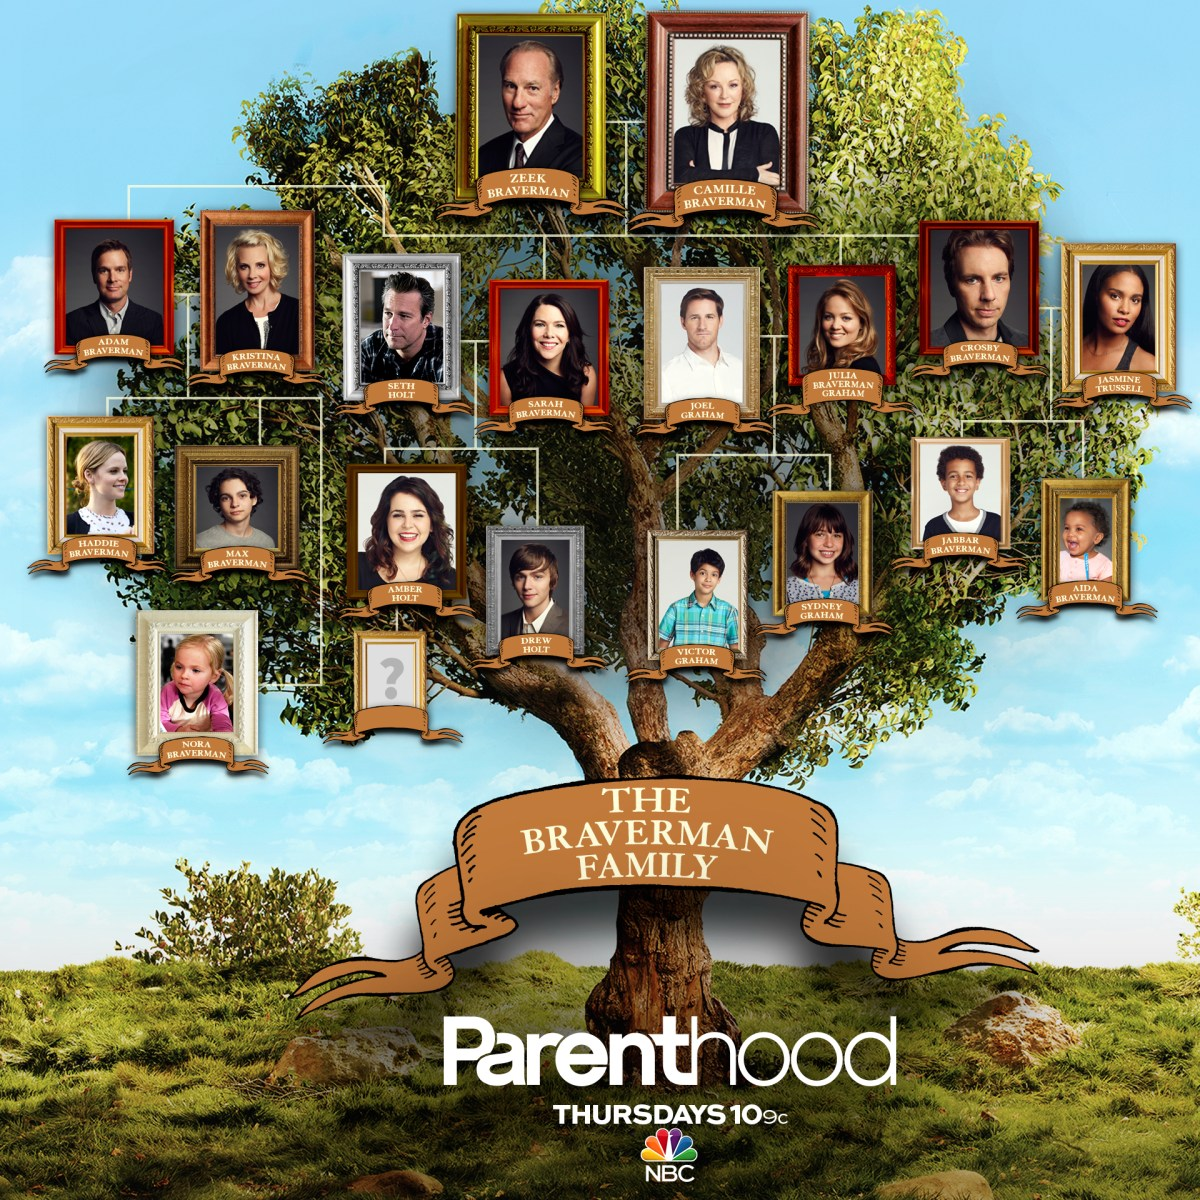 Farewell Parenthood [the tv show]